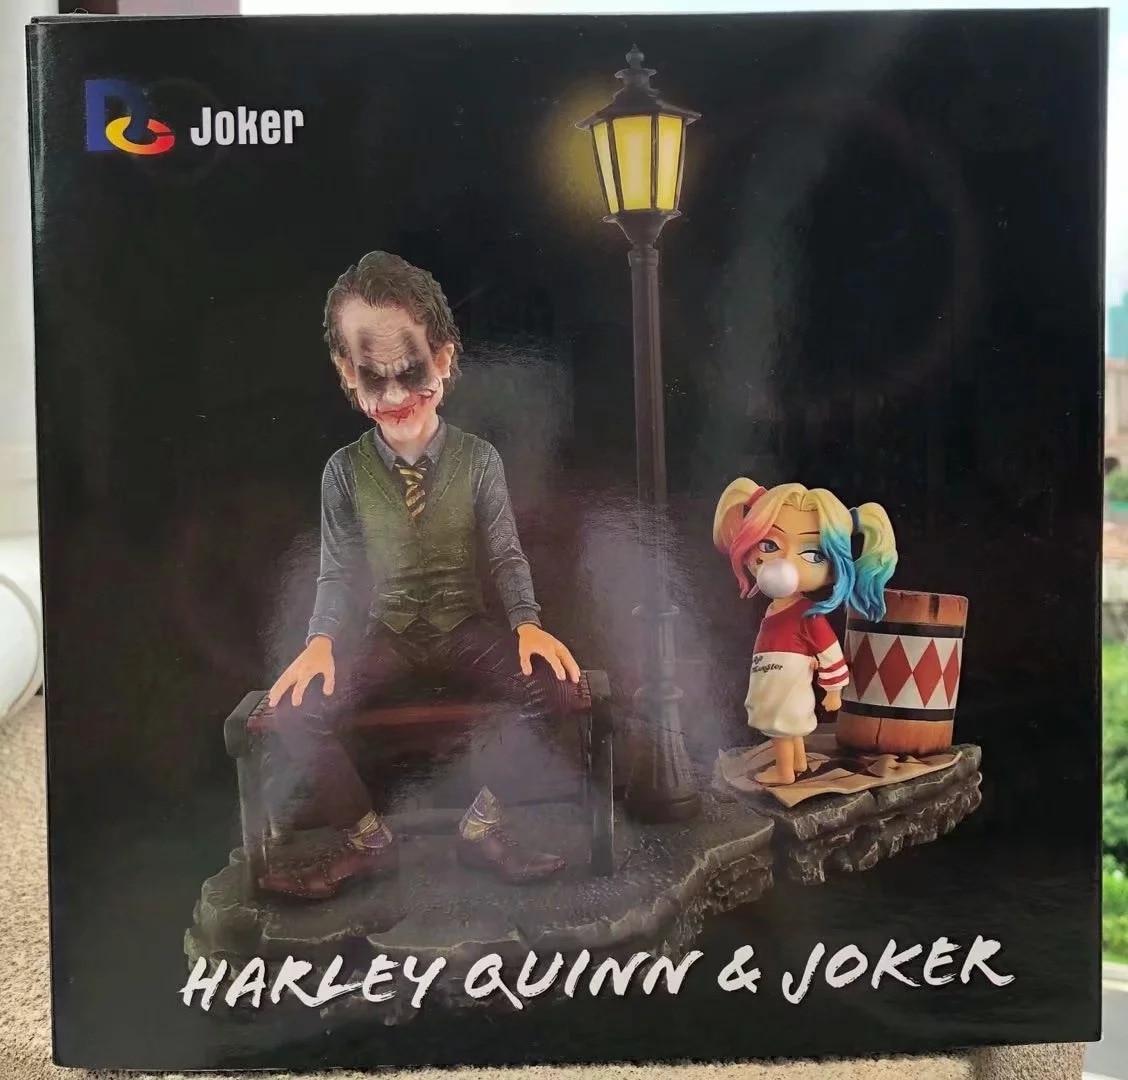 DC Joker Harley Quinn yapmak Esquadrao Suicida & Joker Coringa e Harley Quinn Boneca Tahsil Action Figure PVC Modelo ConjuntoDC Joker Harley Quinn yapmak Esquadrao Suicida & Joker Coringa e Harley Quinn Boneca Tahsil Action Figure PVC Modelo Conjunto